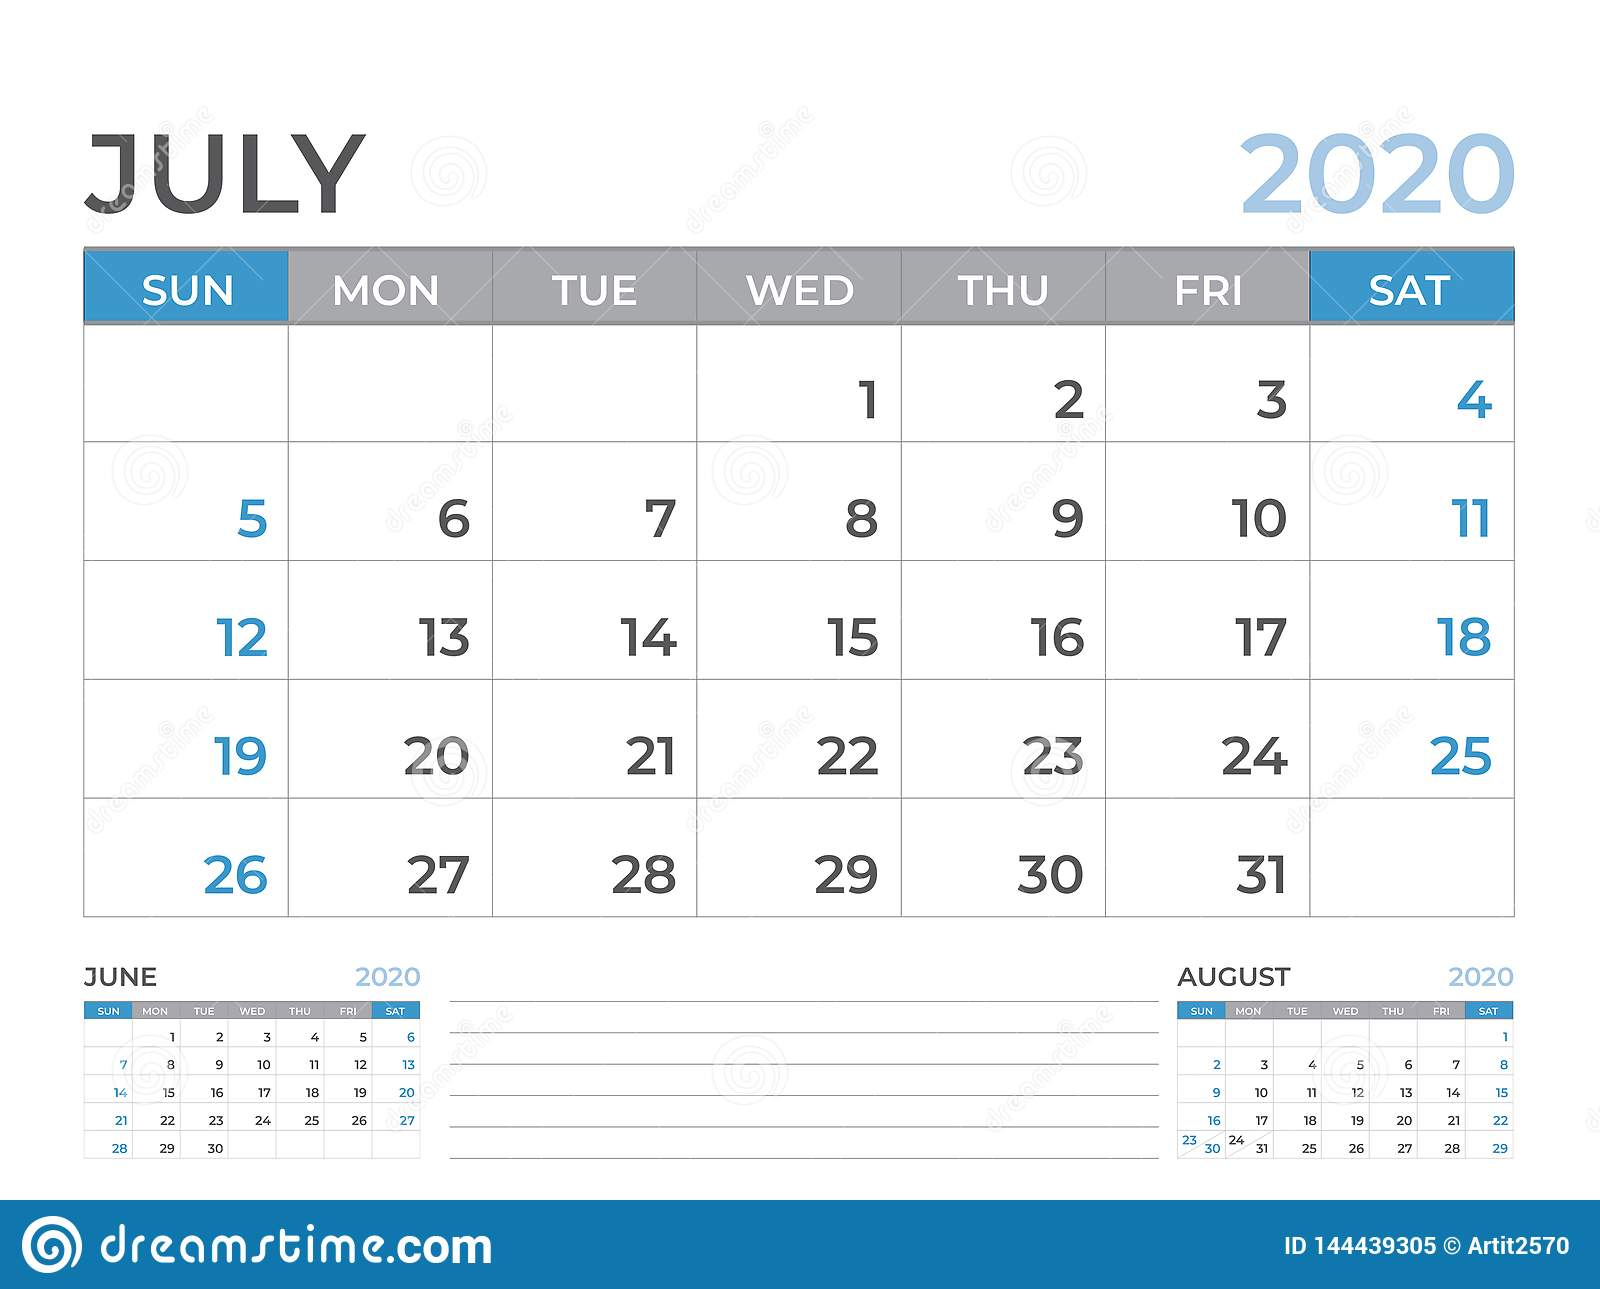 June 2020 Calendar Template, Desk Calendar Layout Size 8 X 6 Inch with 2 Week Schedule Template Mon- Sunday